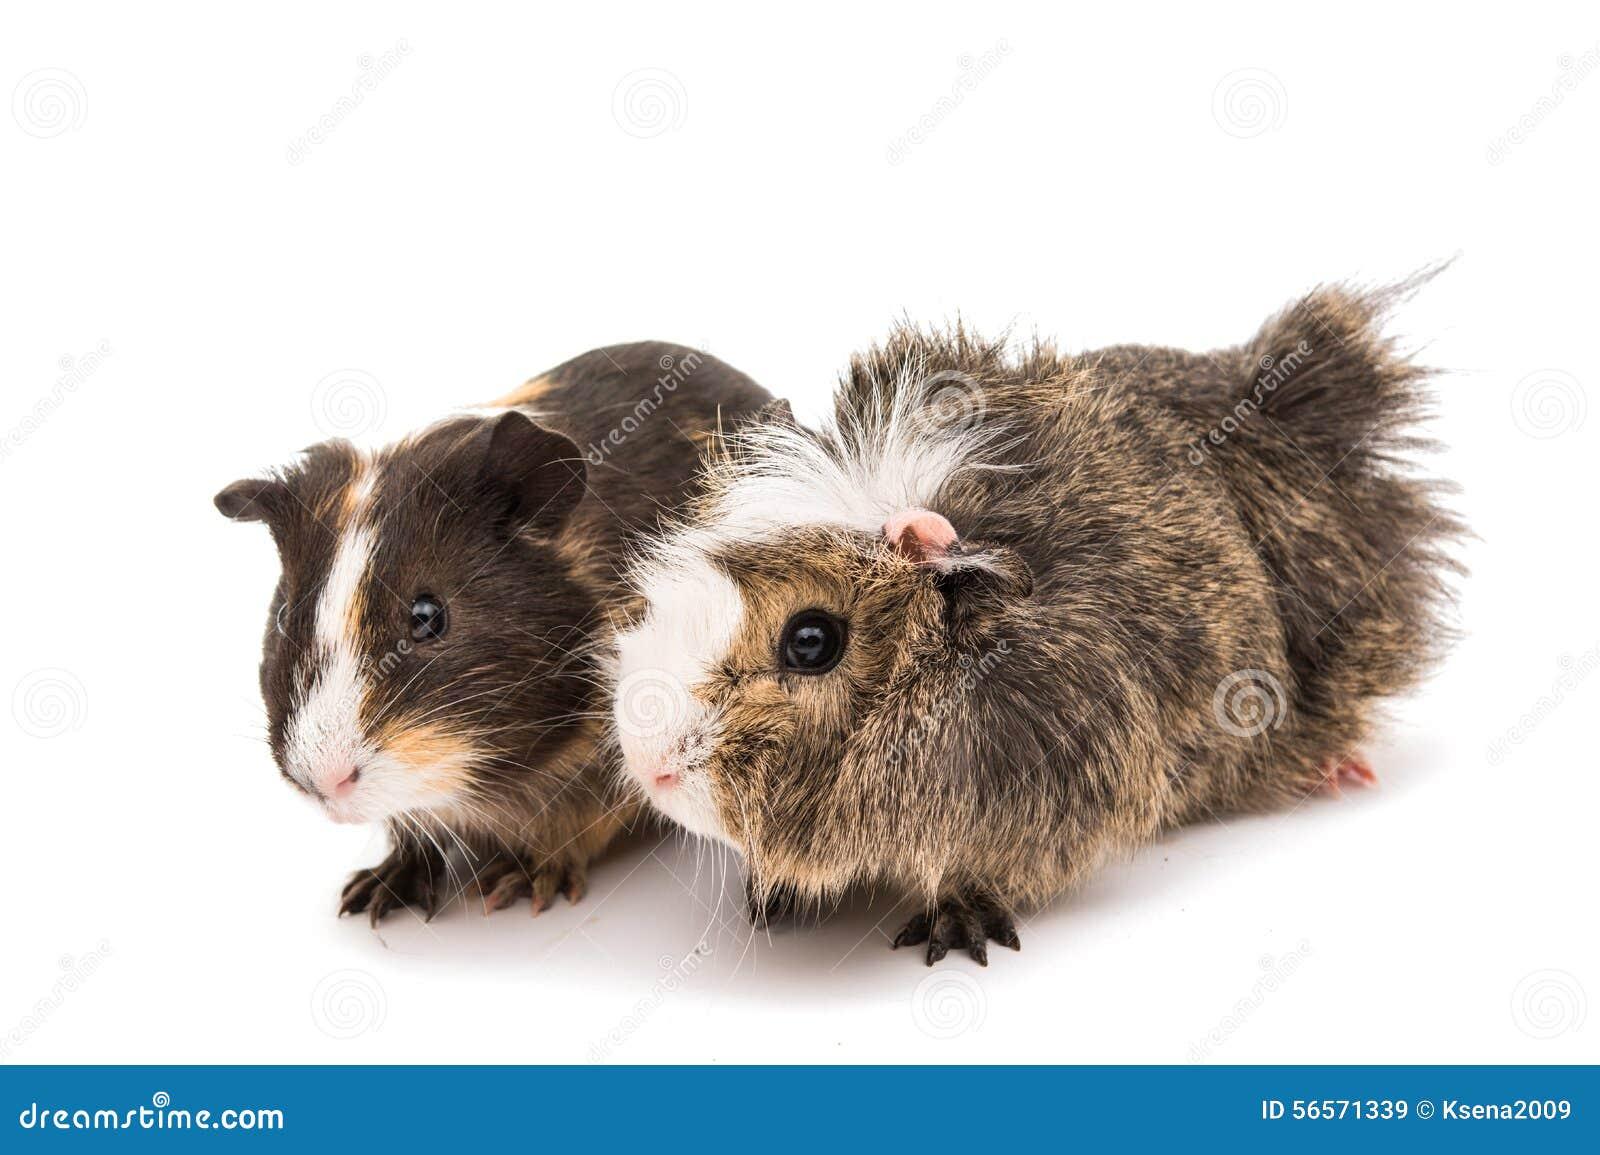 Download 6587 guinea pig shoulder στοκ εικόνα. εικόνα από κανένας - 56571339